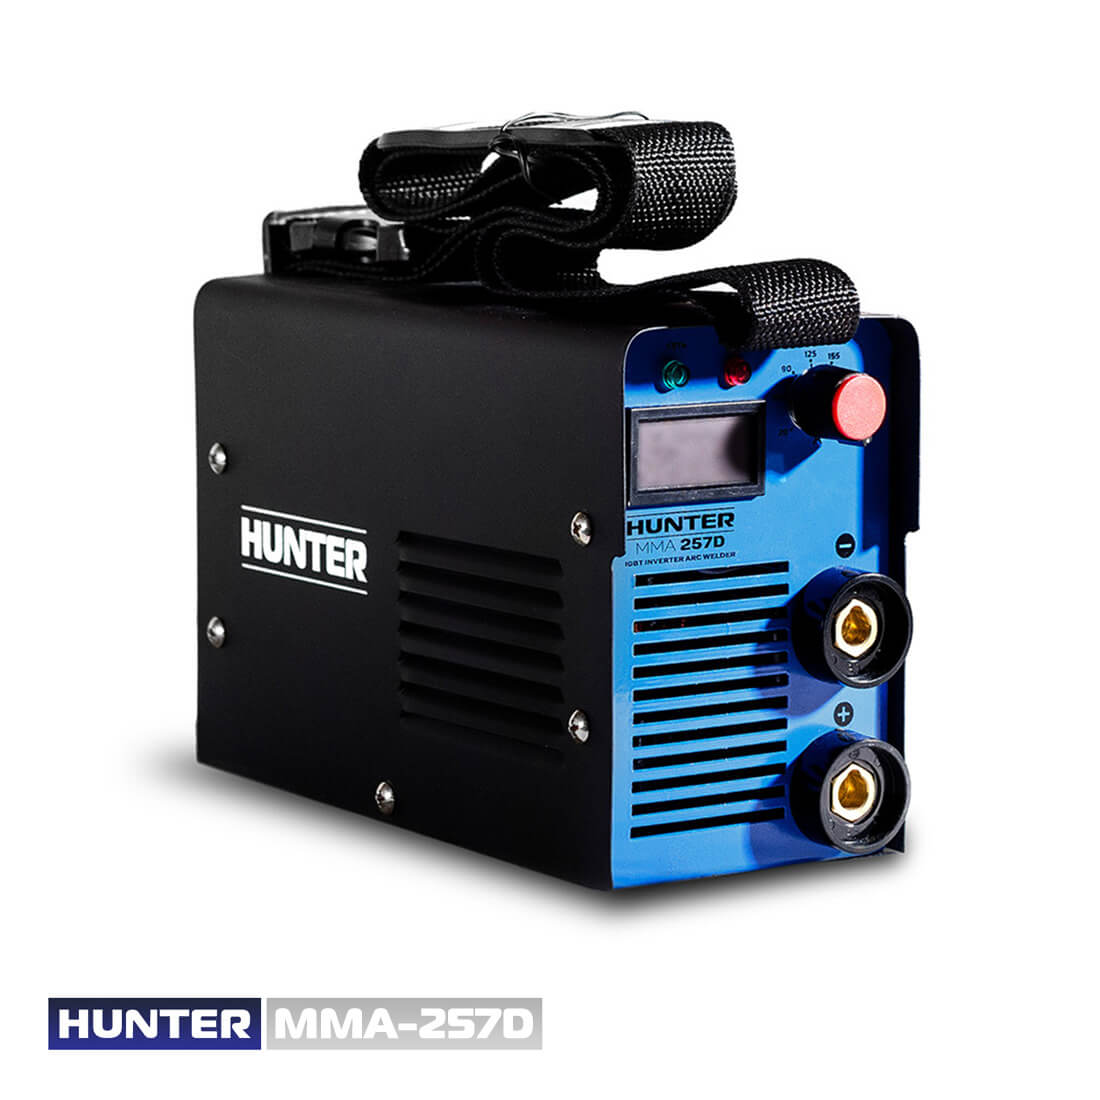 Фото Hunter MMA 257D (дуговая) цена 2250грн №1 — Hunter